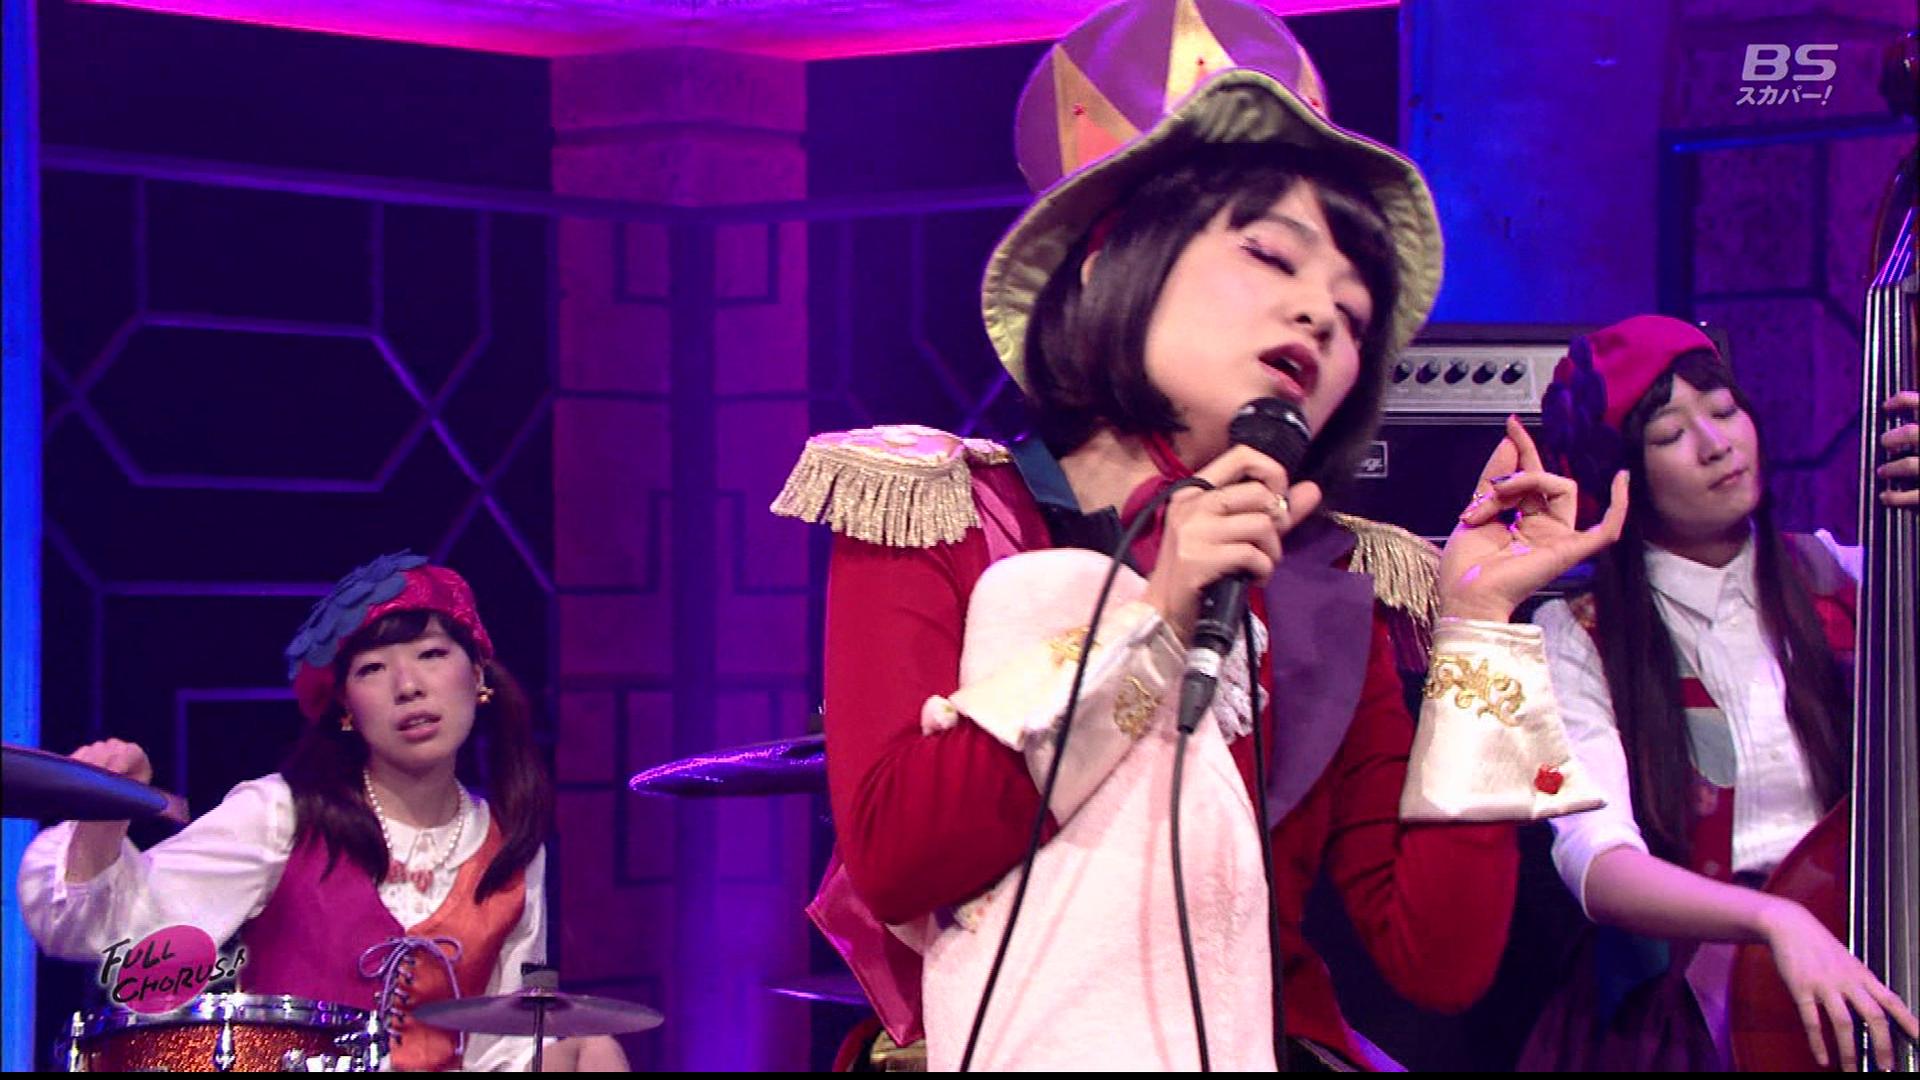 20161116.05.01 CHARAN-PO-RANTAN - Anata no Kuni no Merry-Go-Round (Full Chorus! 2015.06.30 HDTV) (JPOP.ru).ts 1.jpg